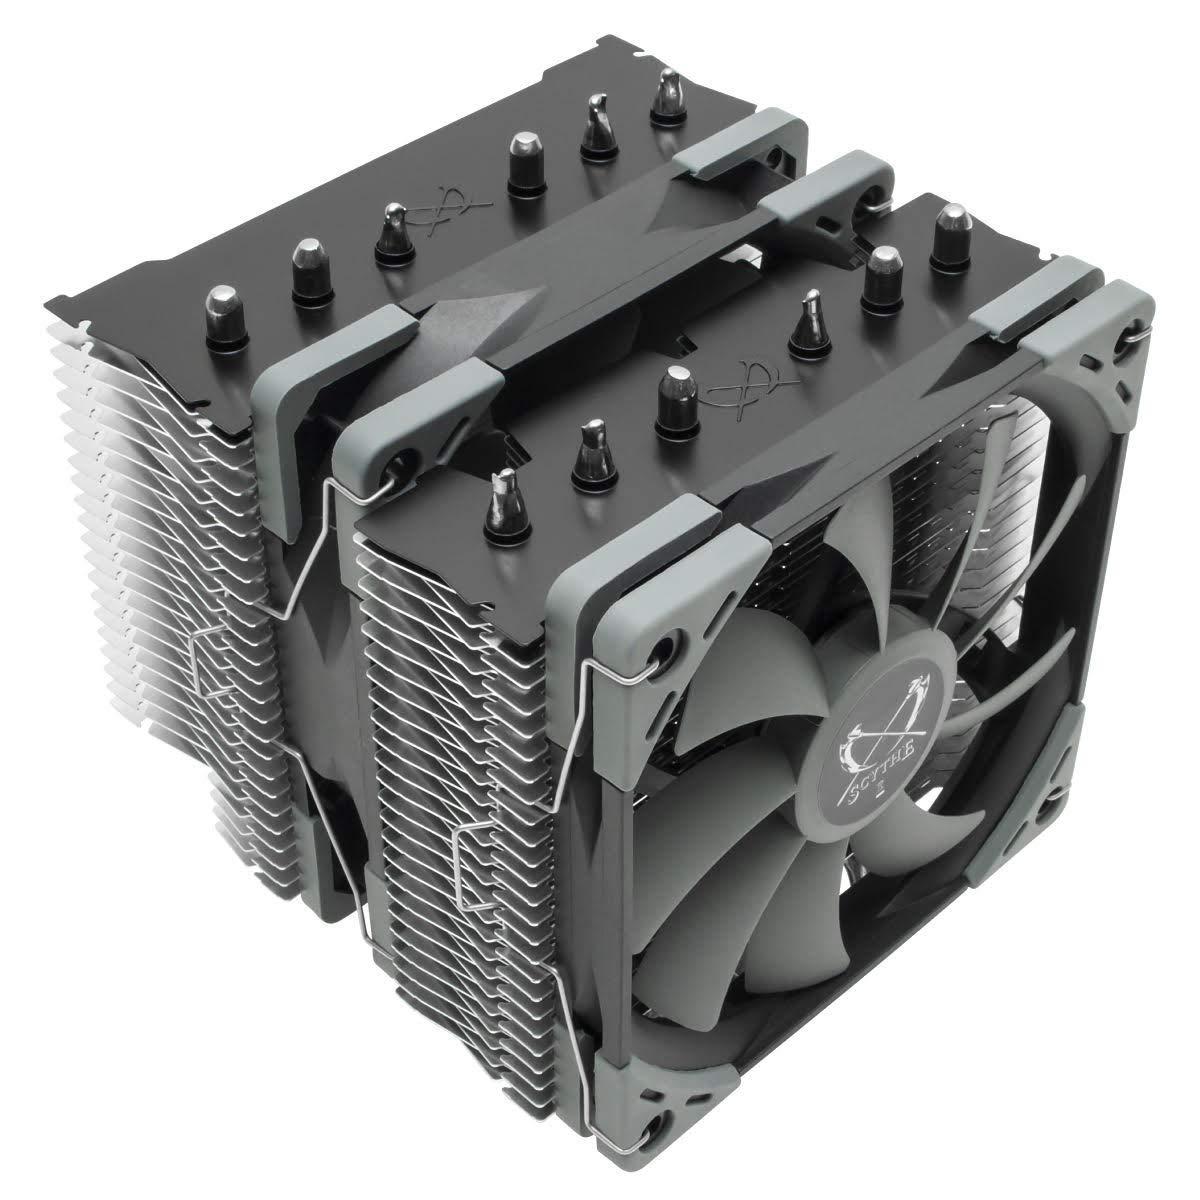 Top Low Profile CPU Cooler